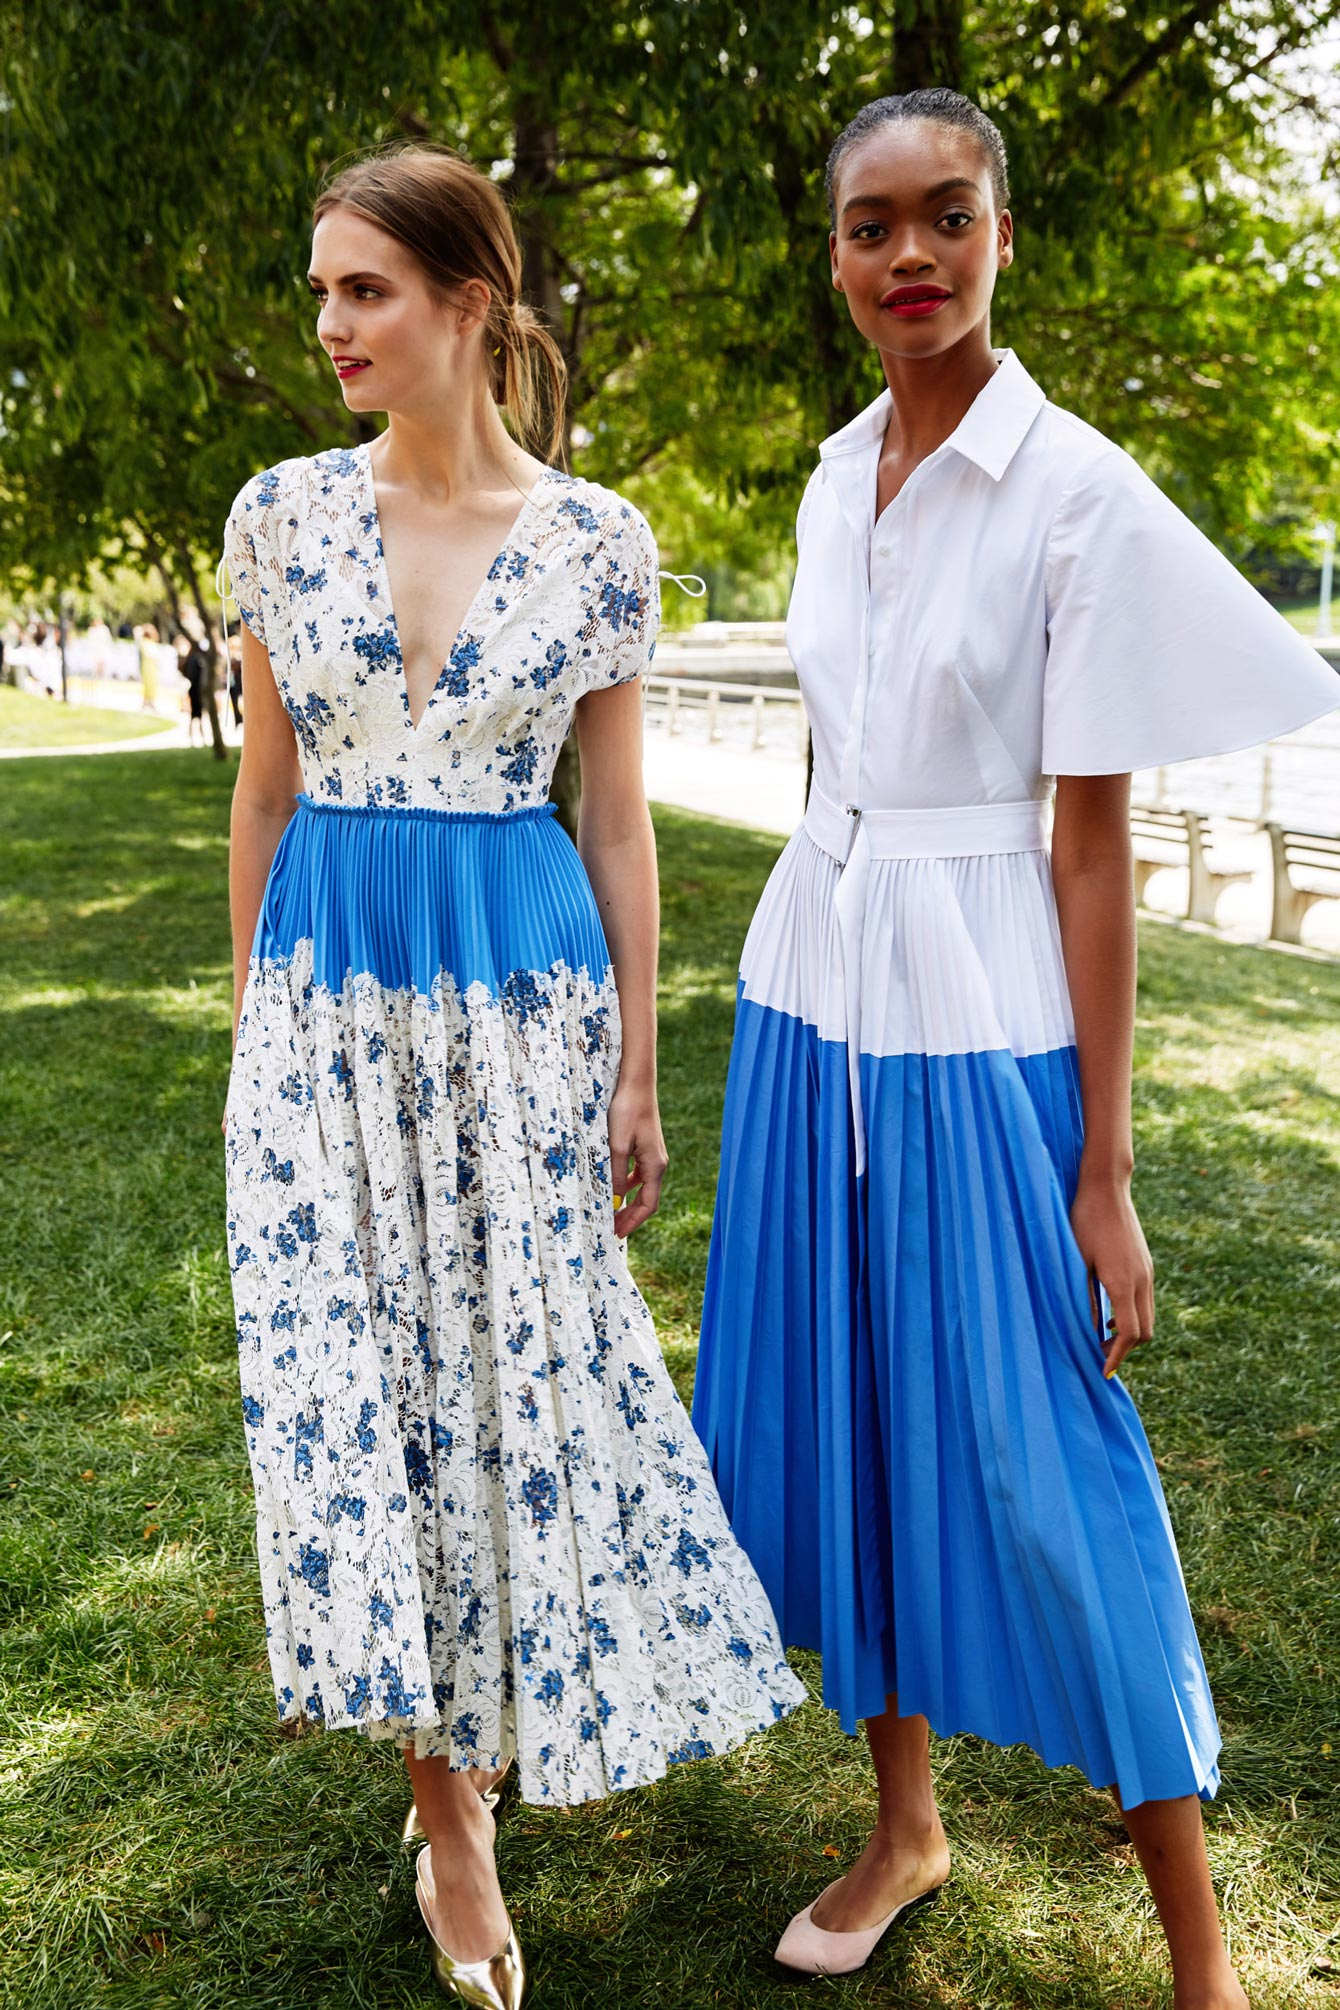 Lela Rose Blue White Pleated Dress